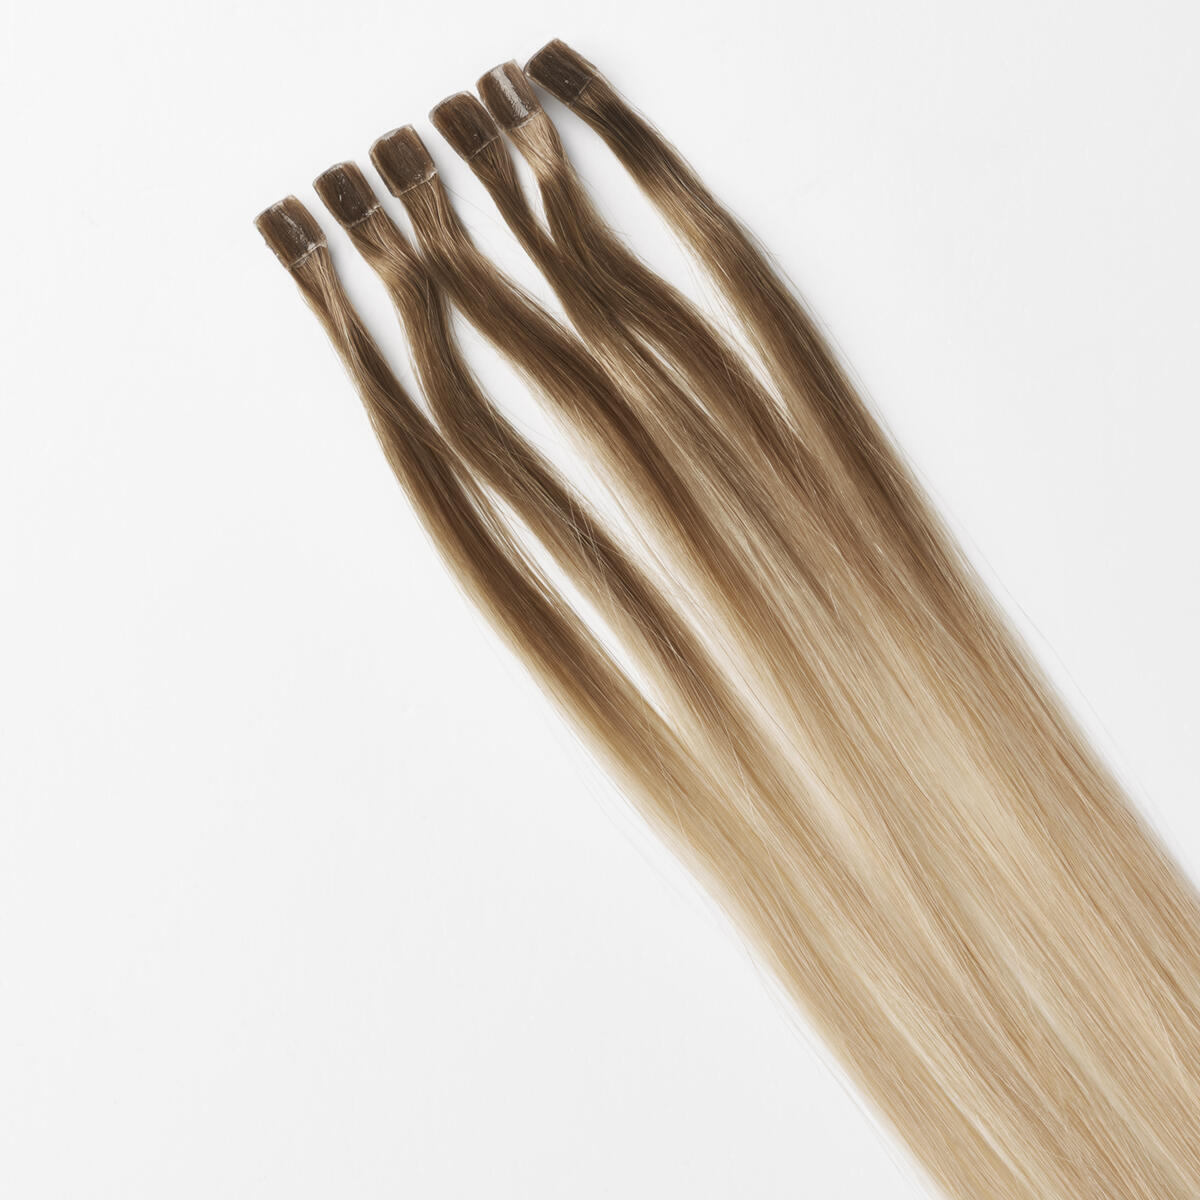 Nail Hair Premium C2.2/10.5 Dark Cool Blonde ColorMelt 40 cm